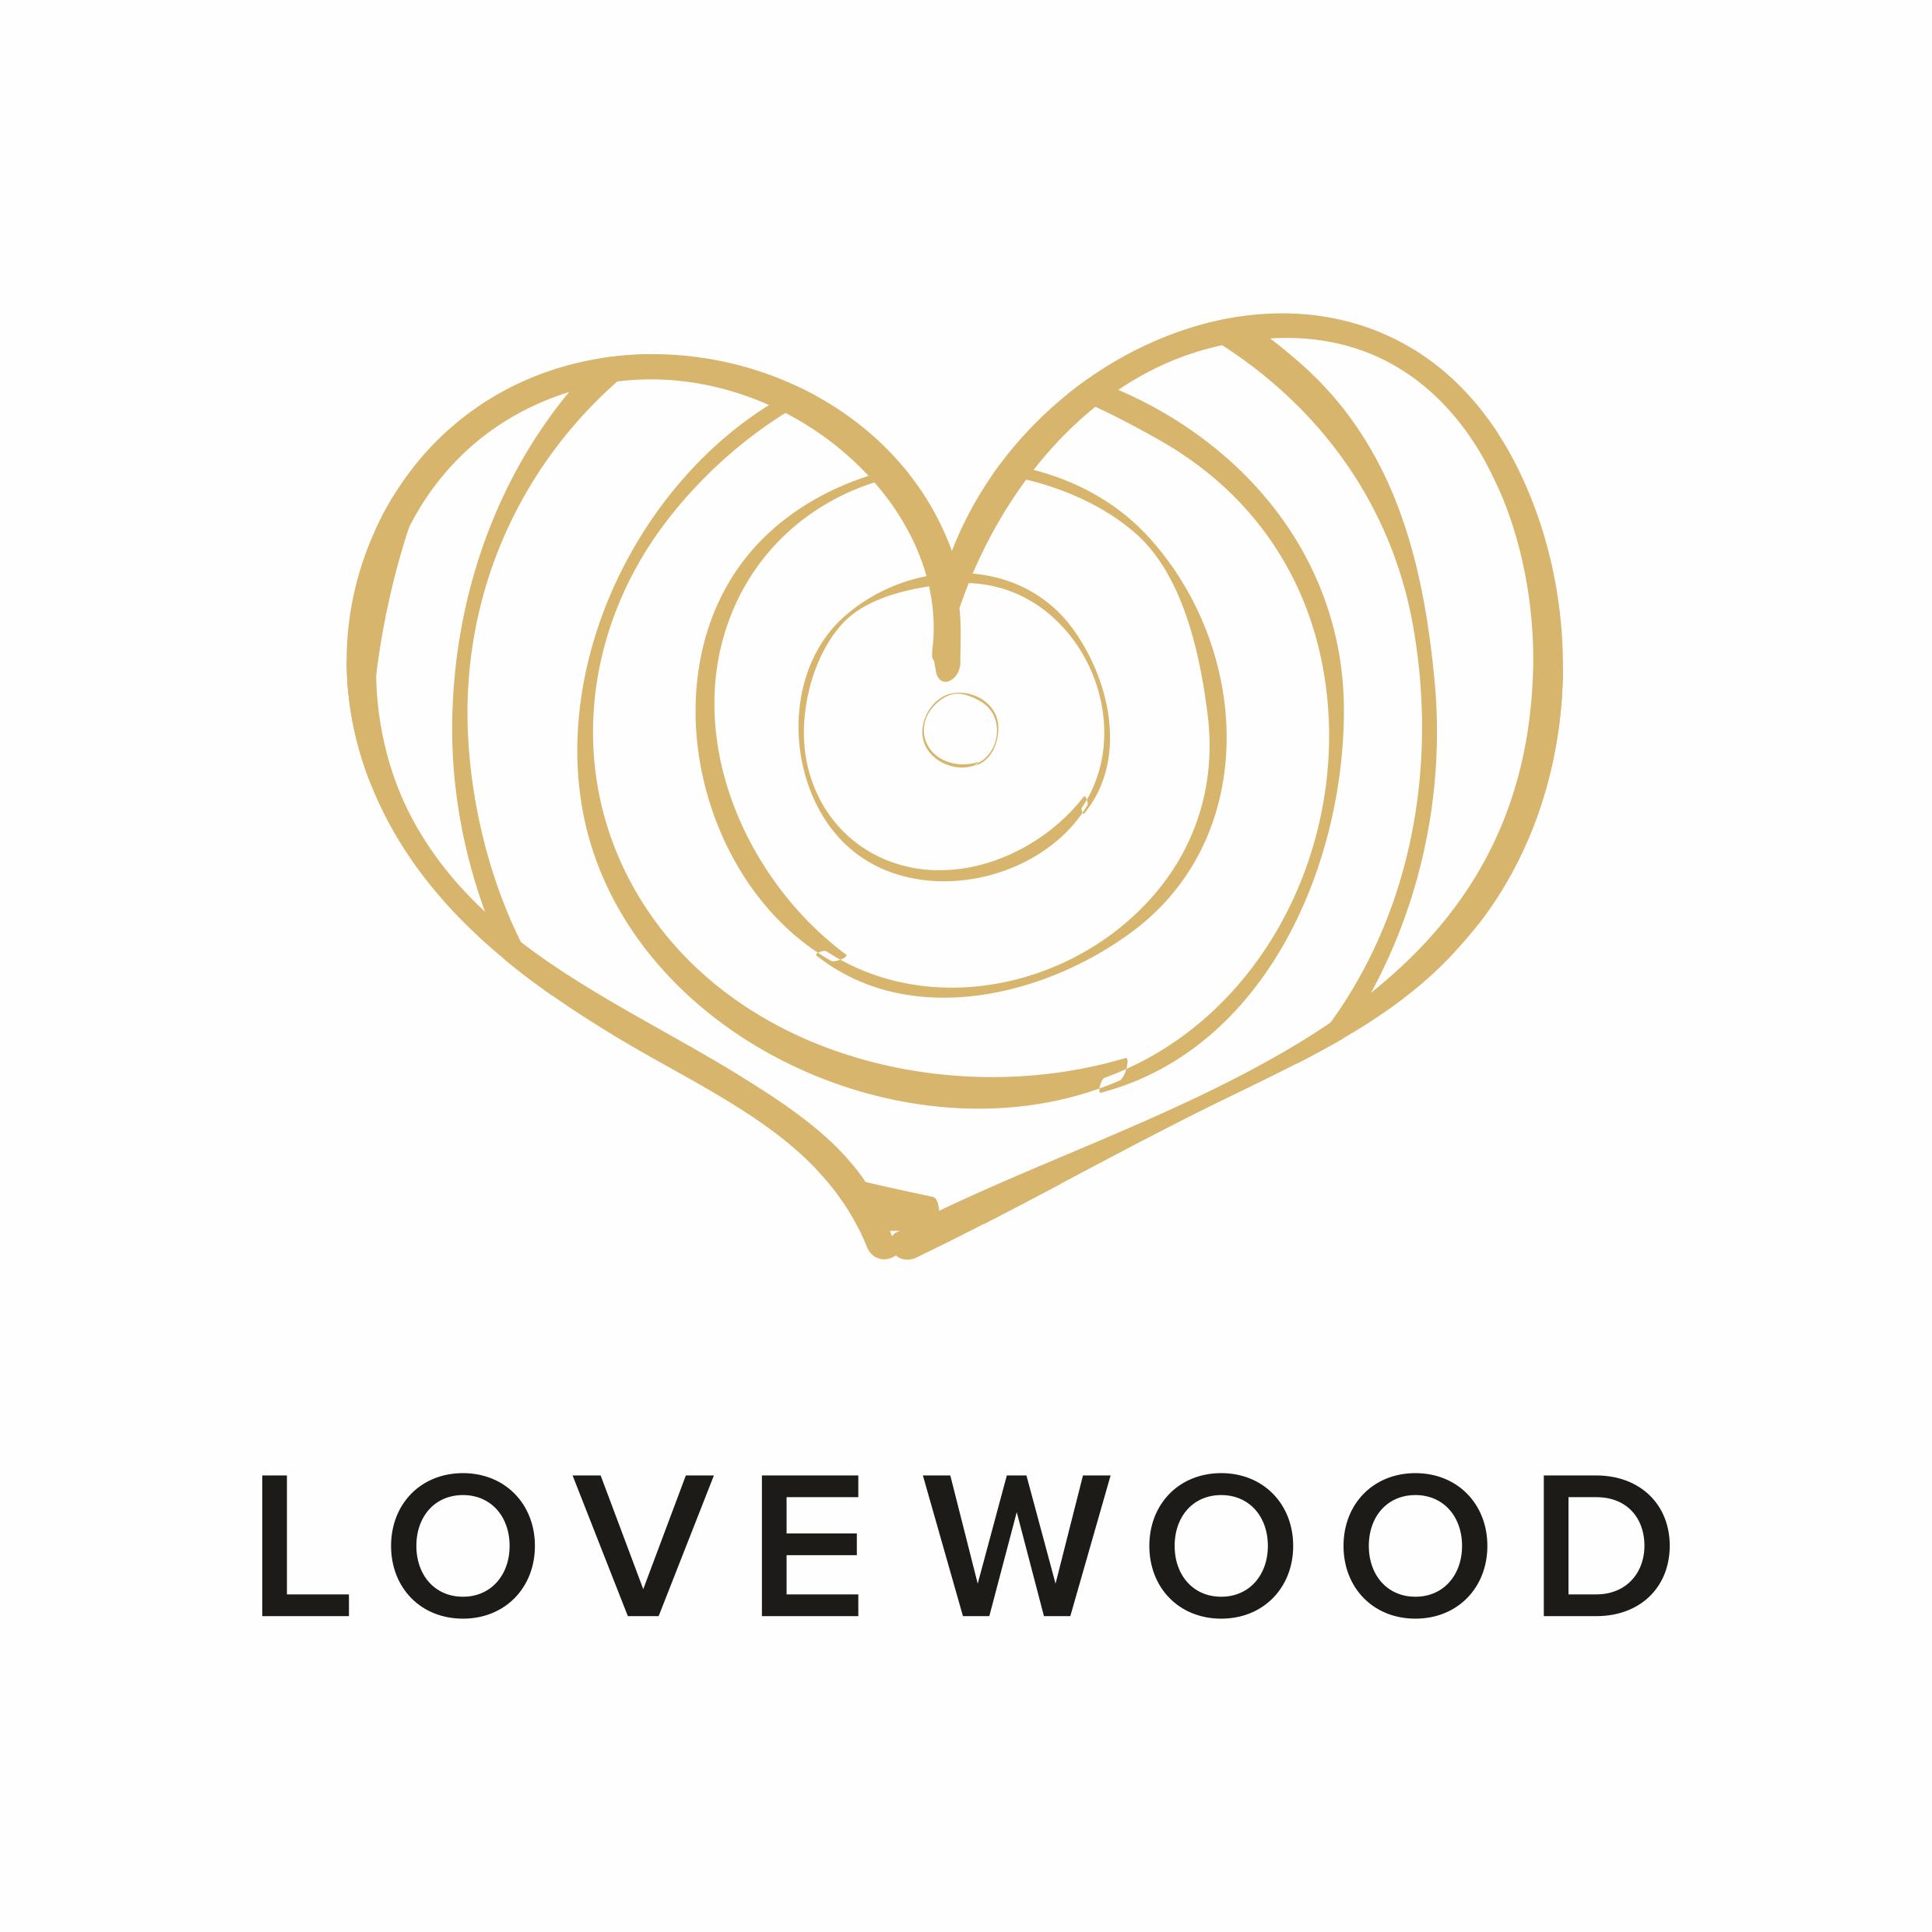 LOVEWOOD_LOGO_2